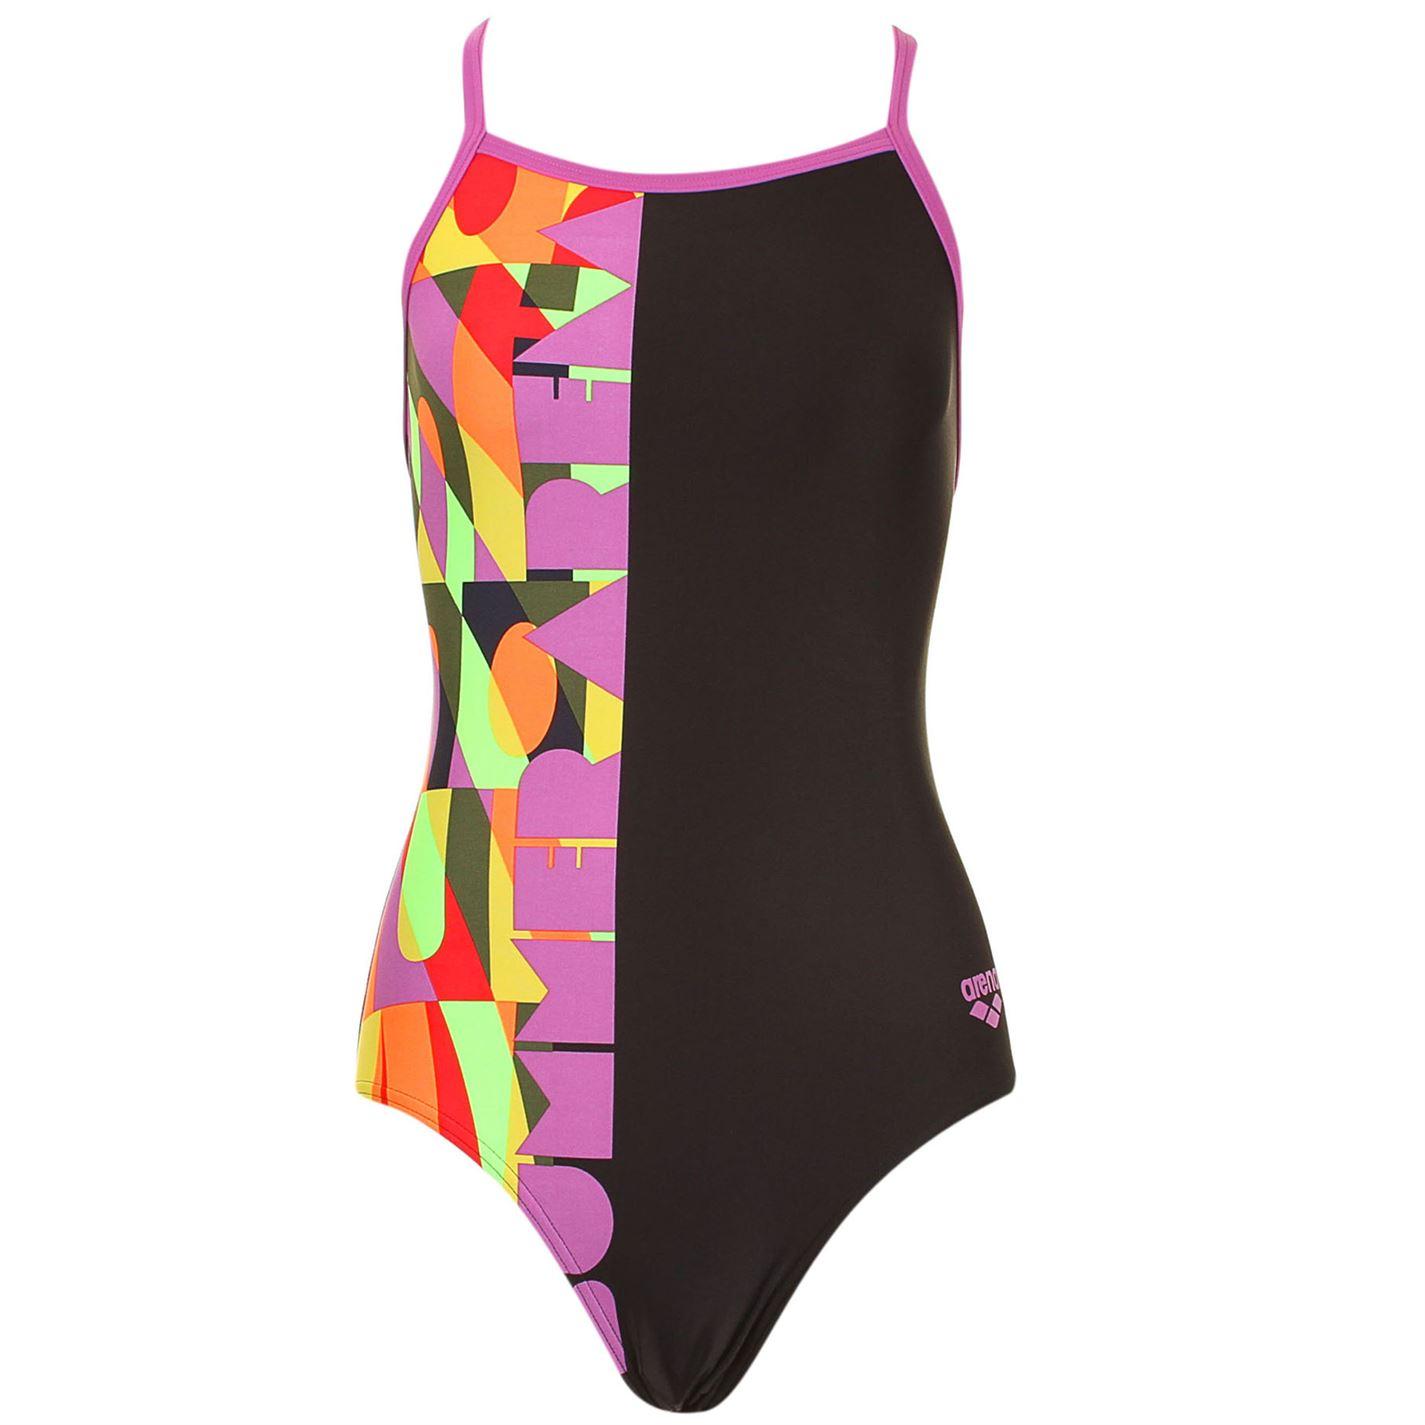 d67349f775fd9 Jednodílne plavky Arena Summer One Piece Swimsuit Ladies - Glami.cz